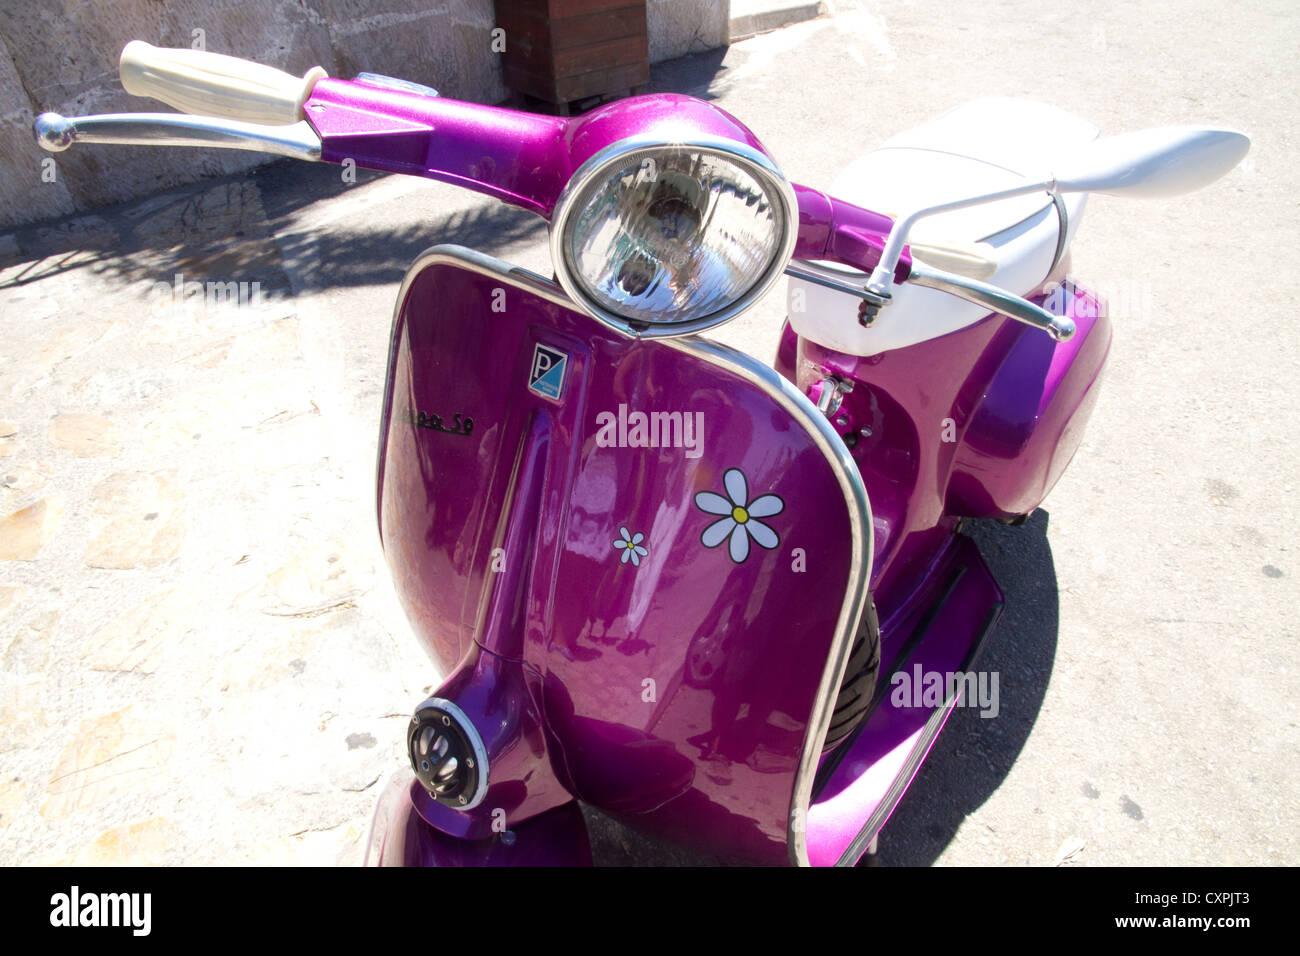 Vespa Piaggio Vintage Violeta Foto Imagen De Stock 50899523 Alamy